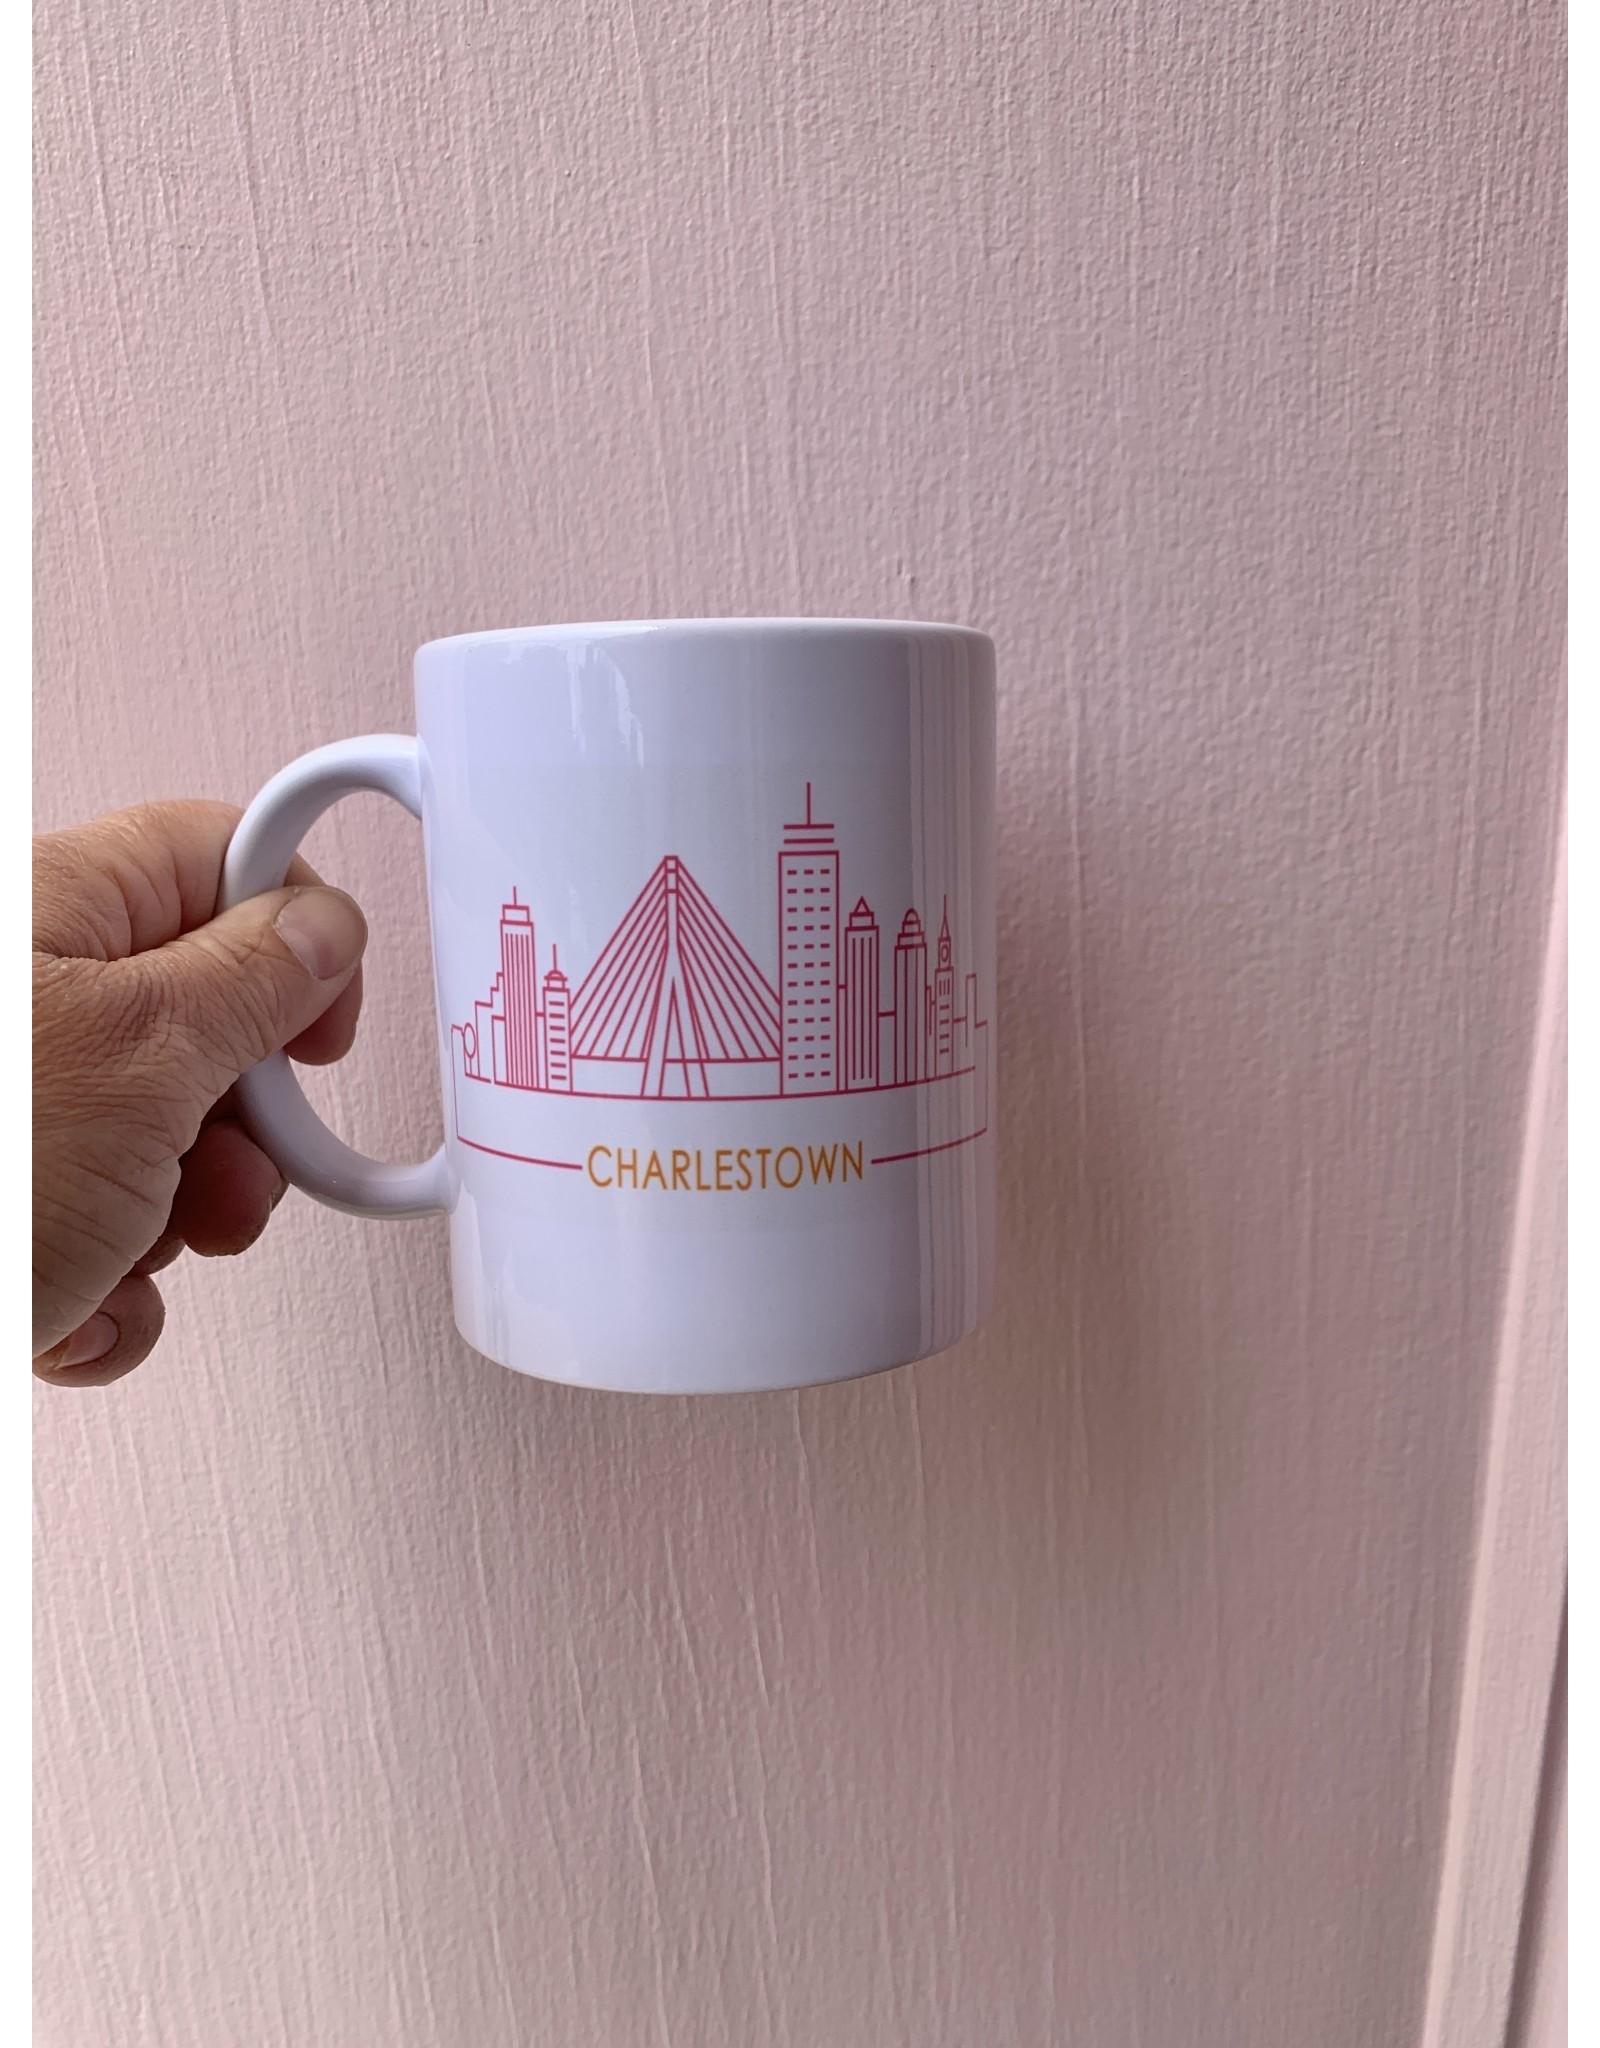 RoseanneBECK Collection Charlestown Skyline Mug in Pink and Orange